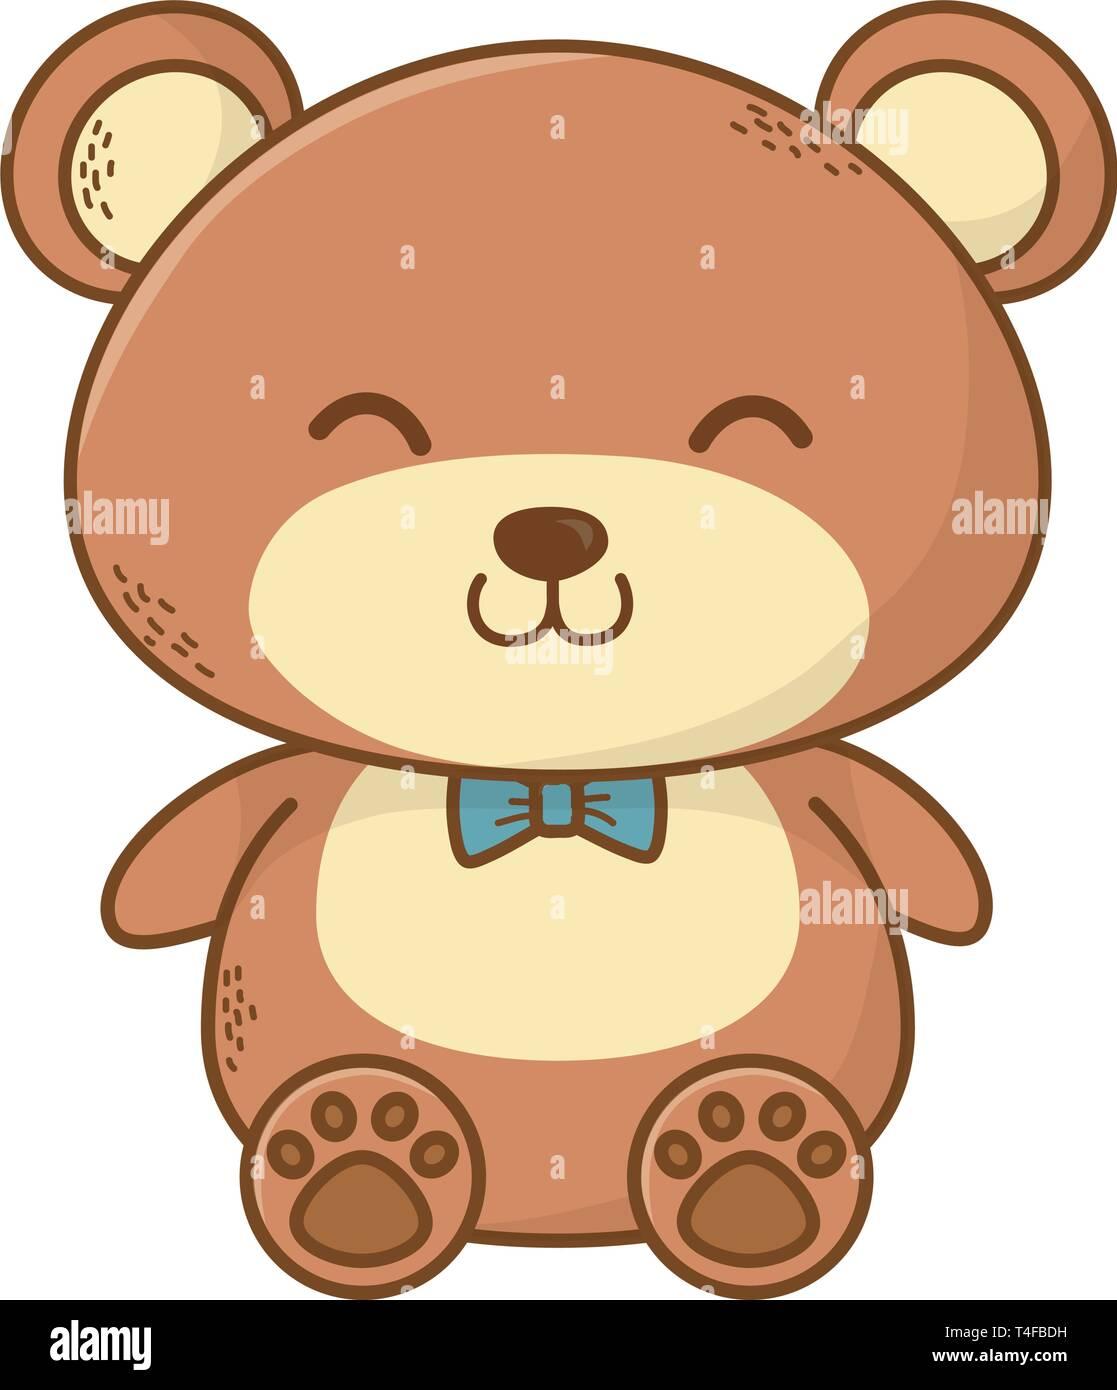 Cute Teddy Bear Cartoon Vector Illustration Graphic Design Stock